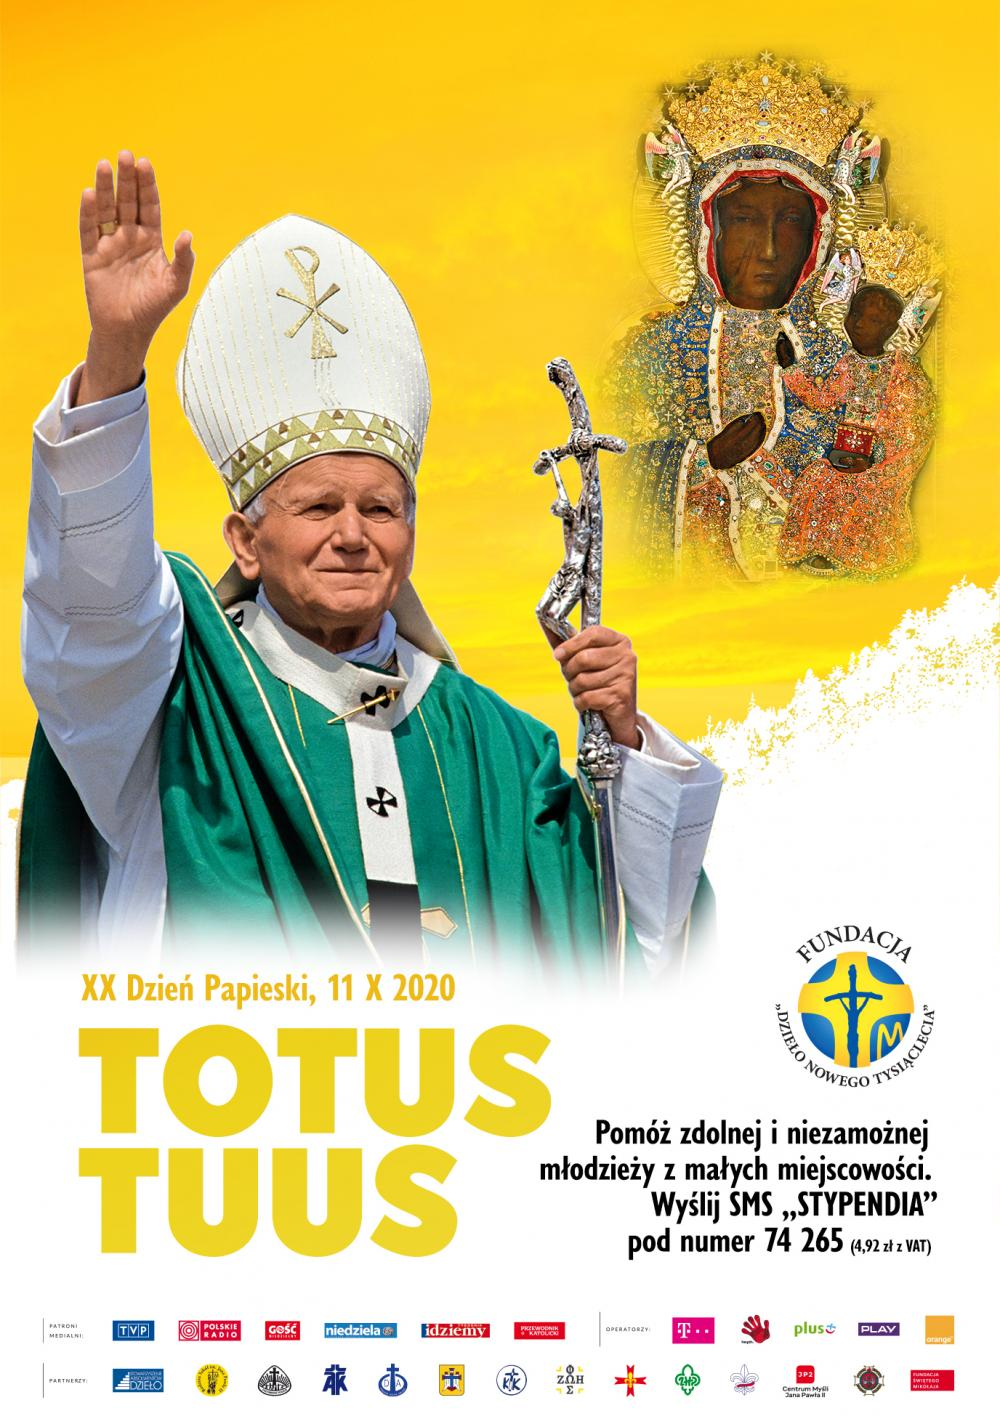 TOTUS TUUS XX Dzień Papieski Niedziela, 11 października 2020 roku